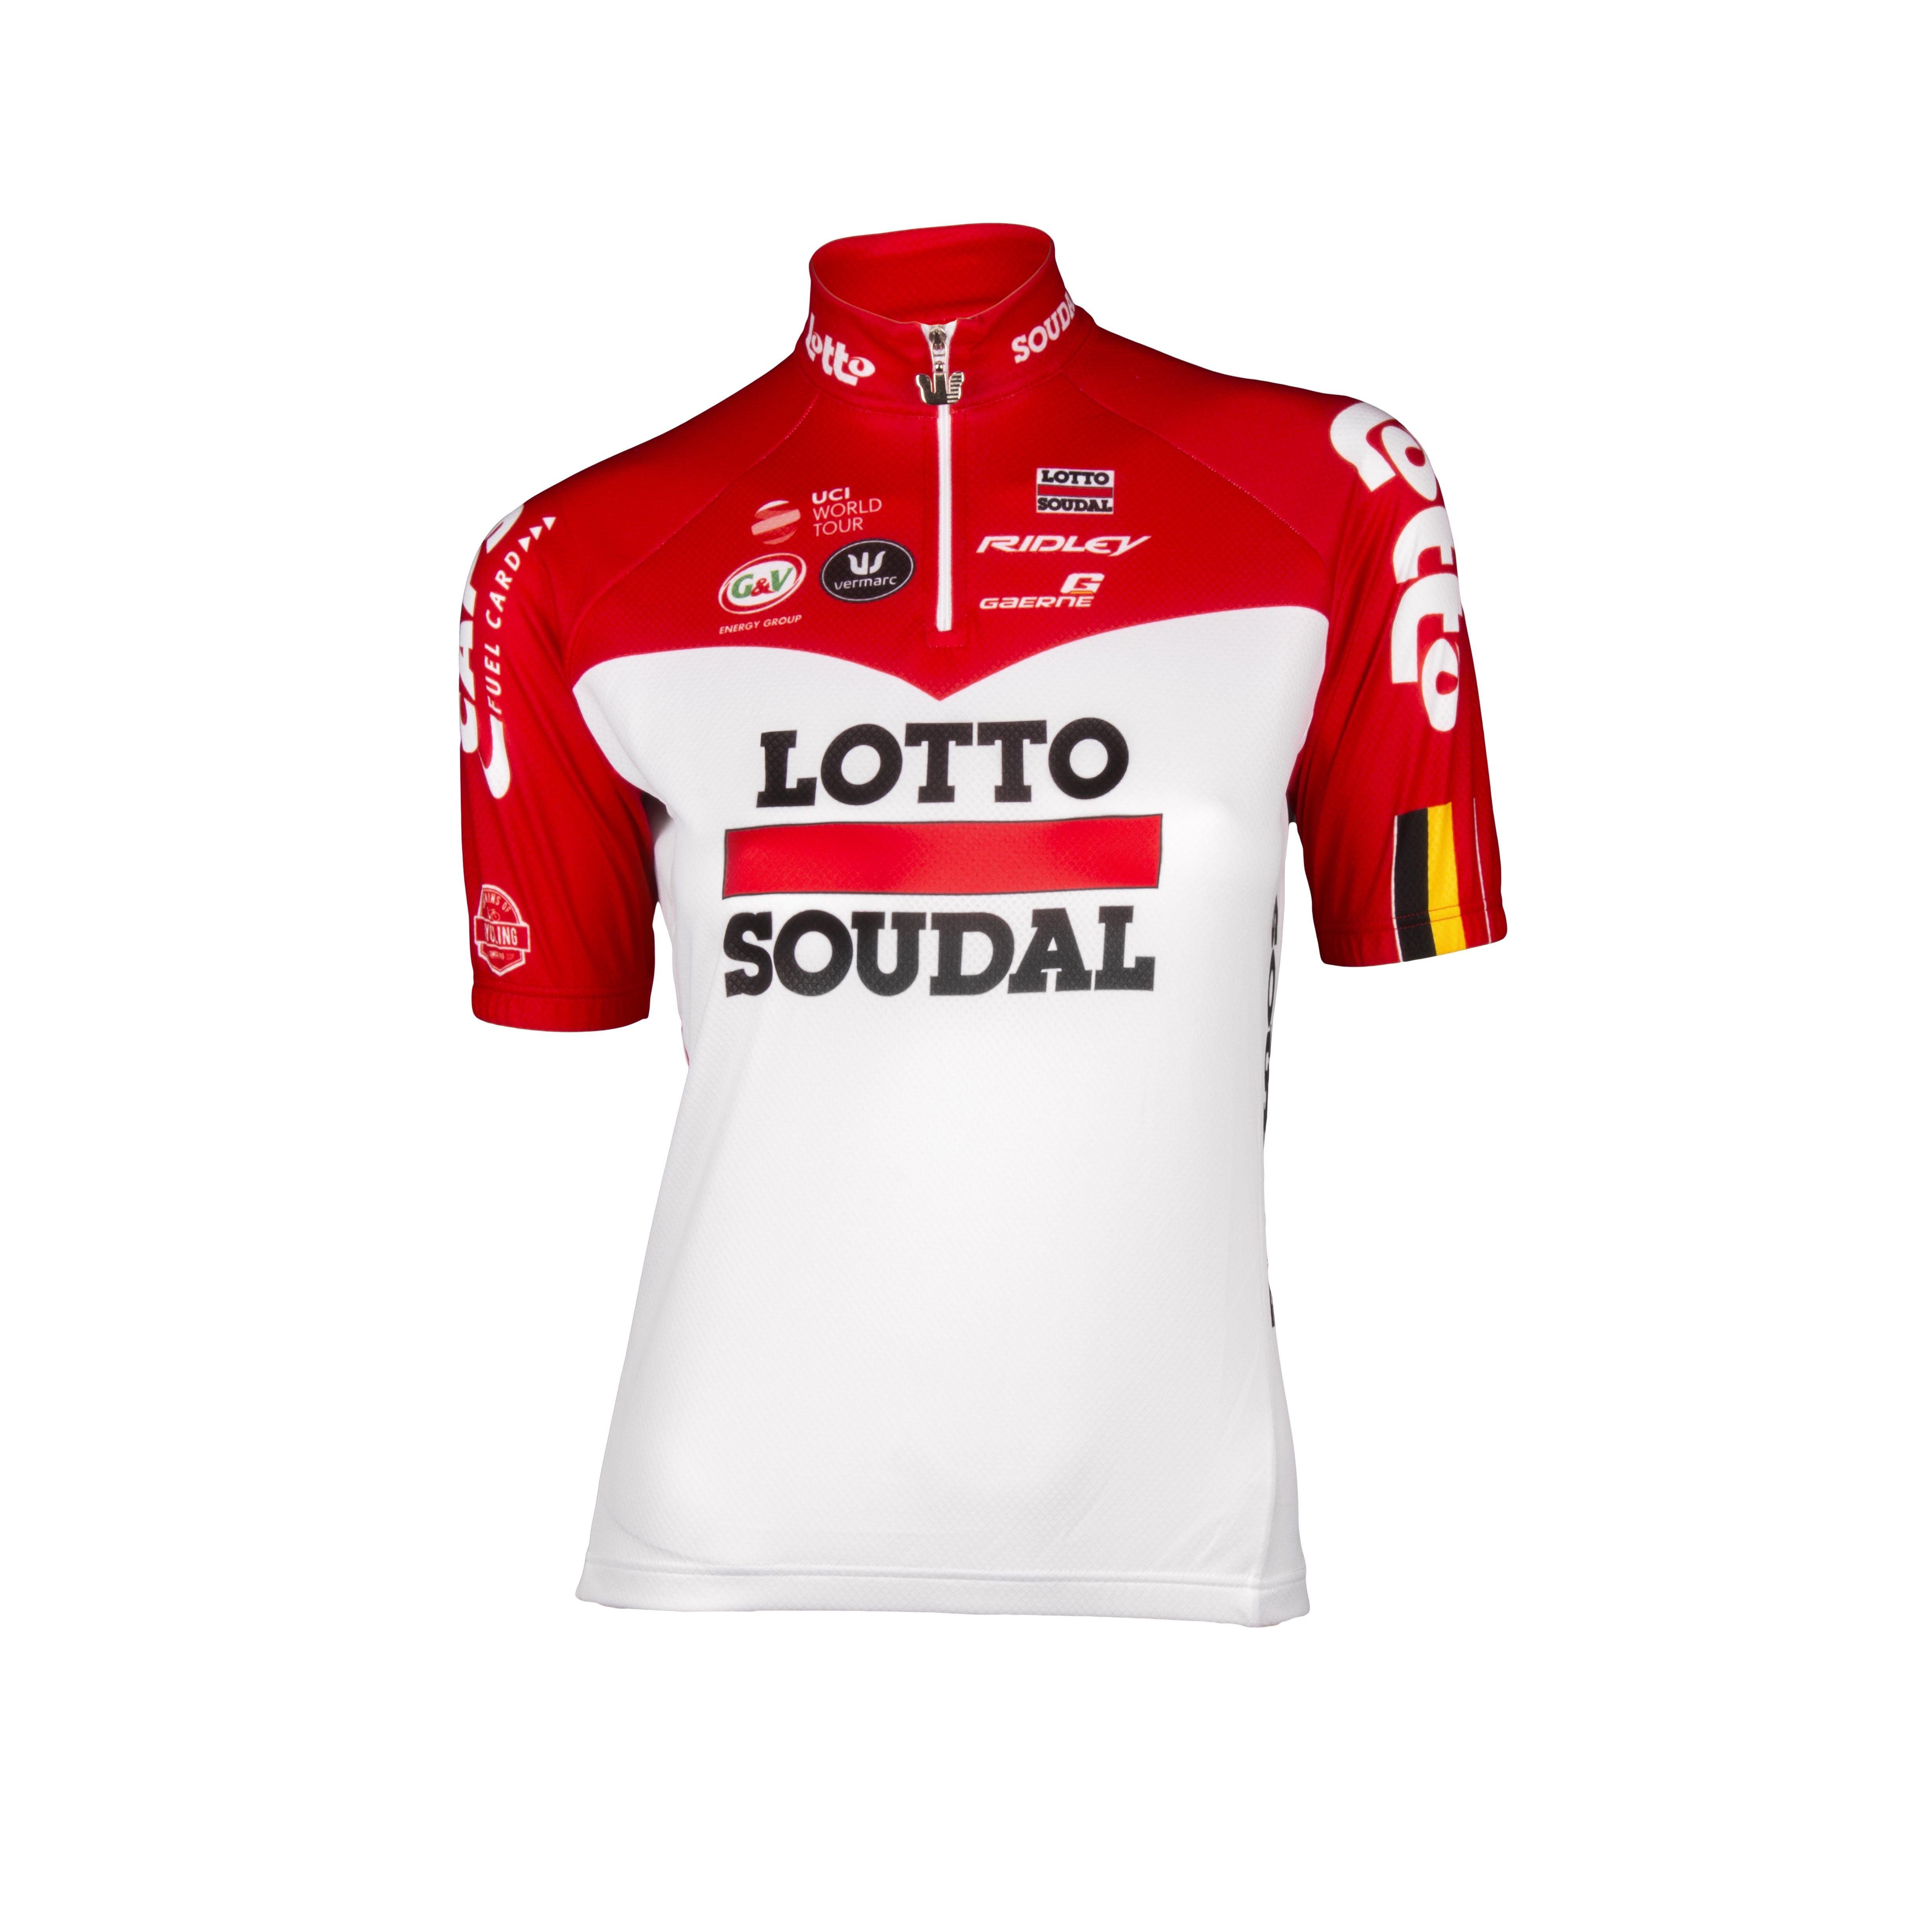 Lotto Soudal 2018 Jersey Short Sleeves Kids